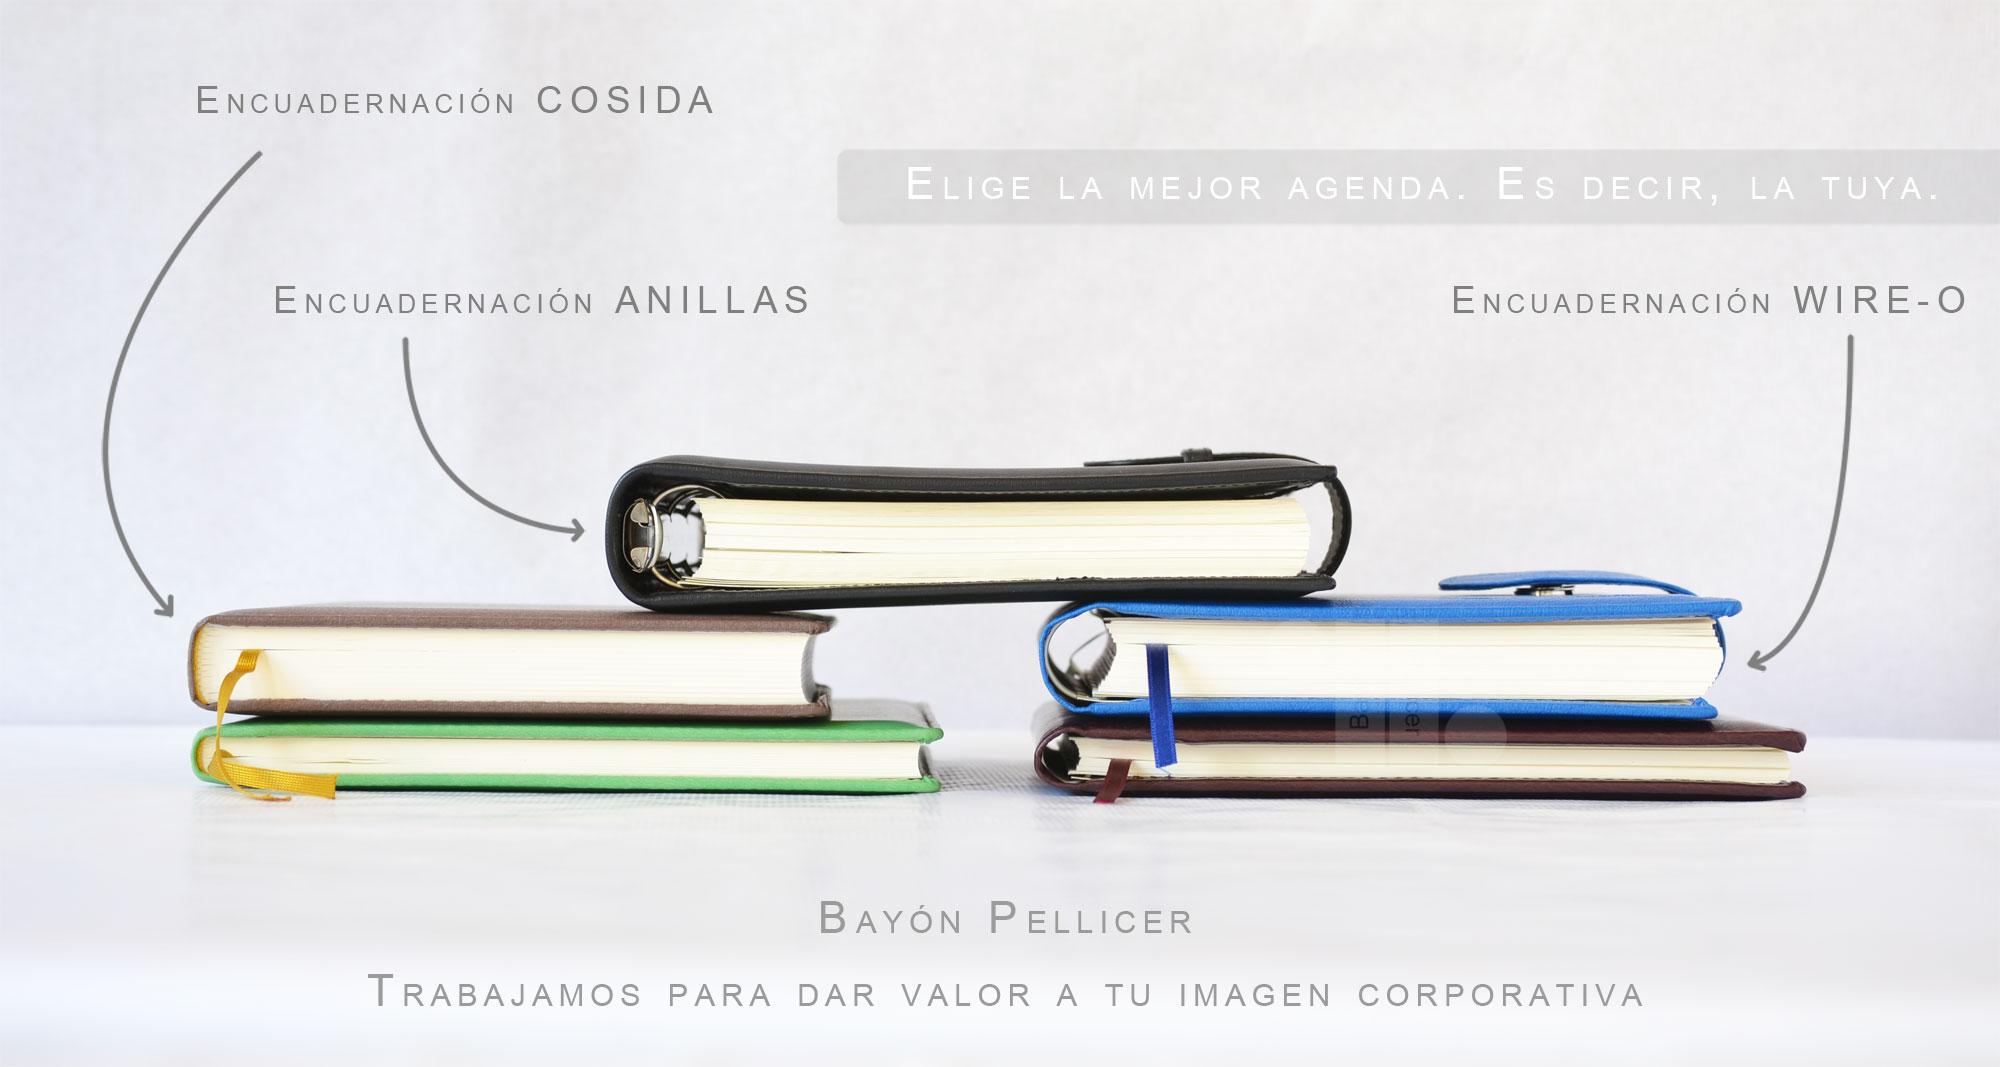 agendas-2019-personalizadas-bayon-pellicer